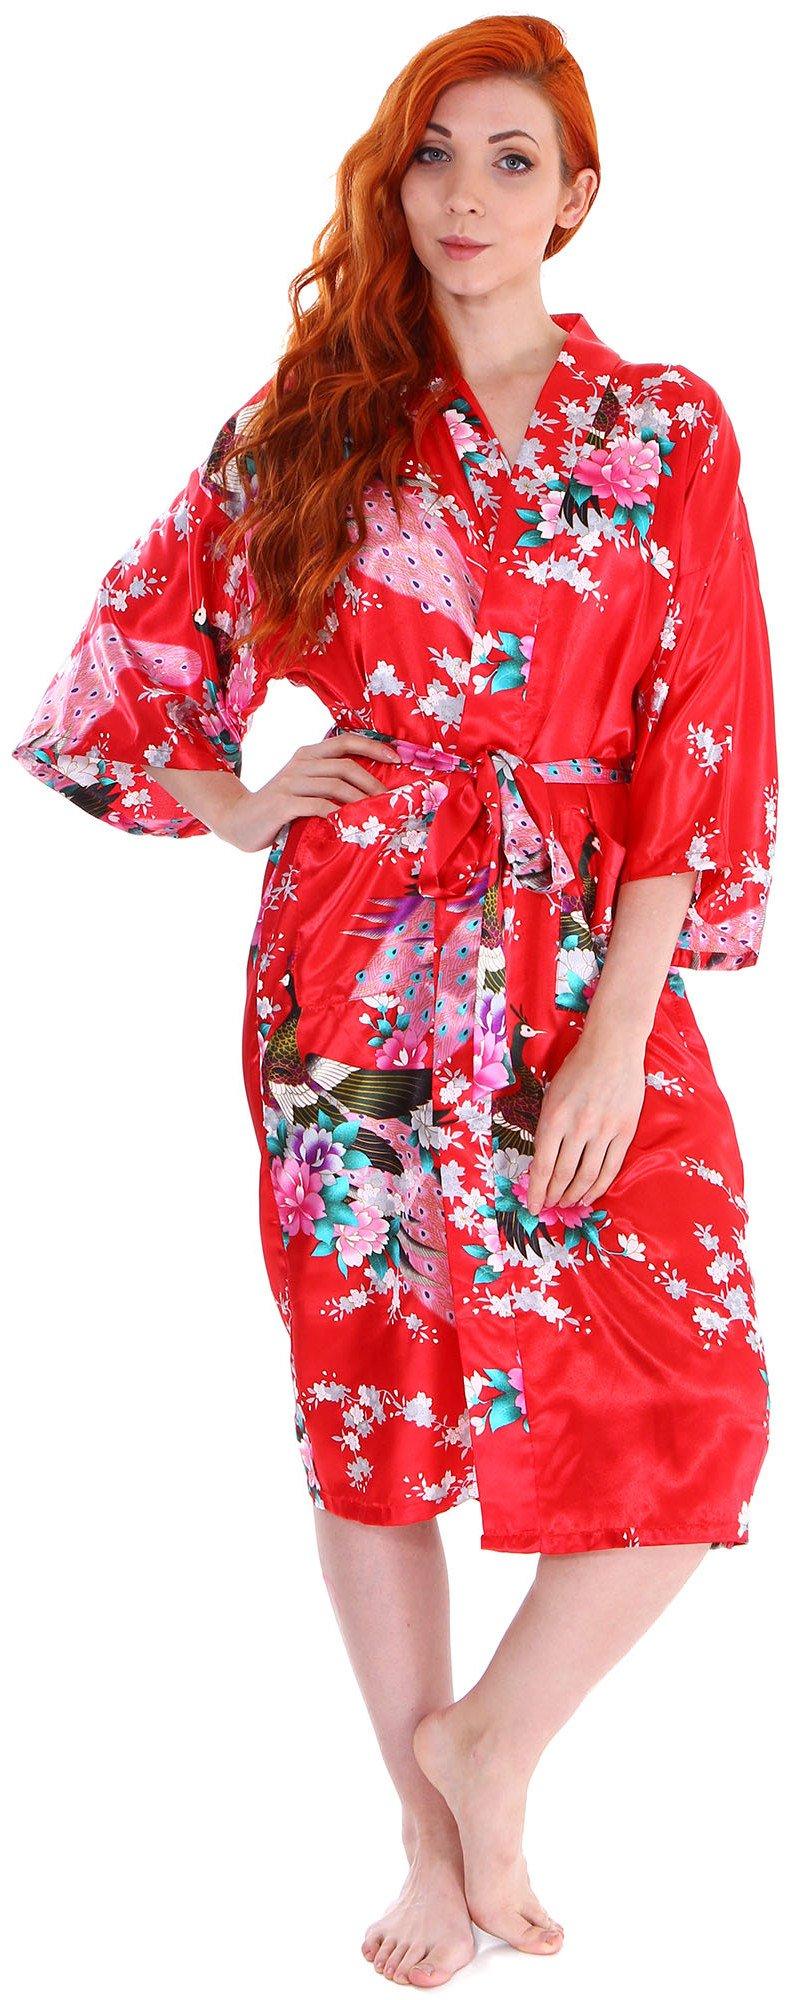 Women's Kimono Robes Peacock Blossoms Silk Satin Long Nightgown Sleepwear, Red